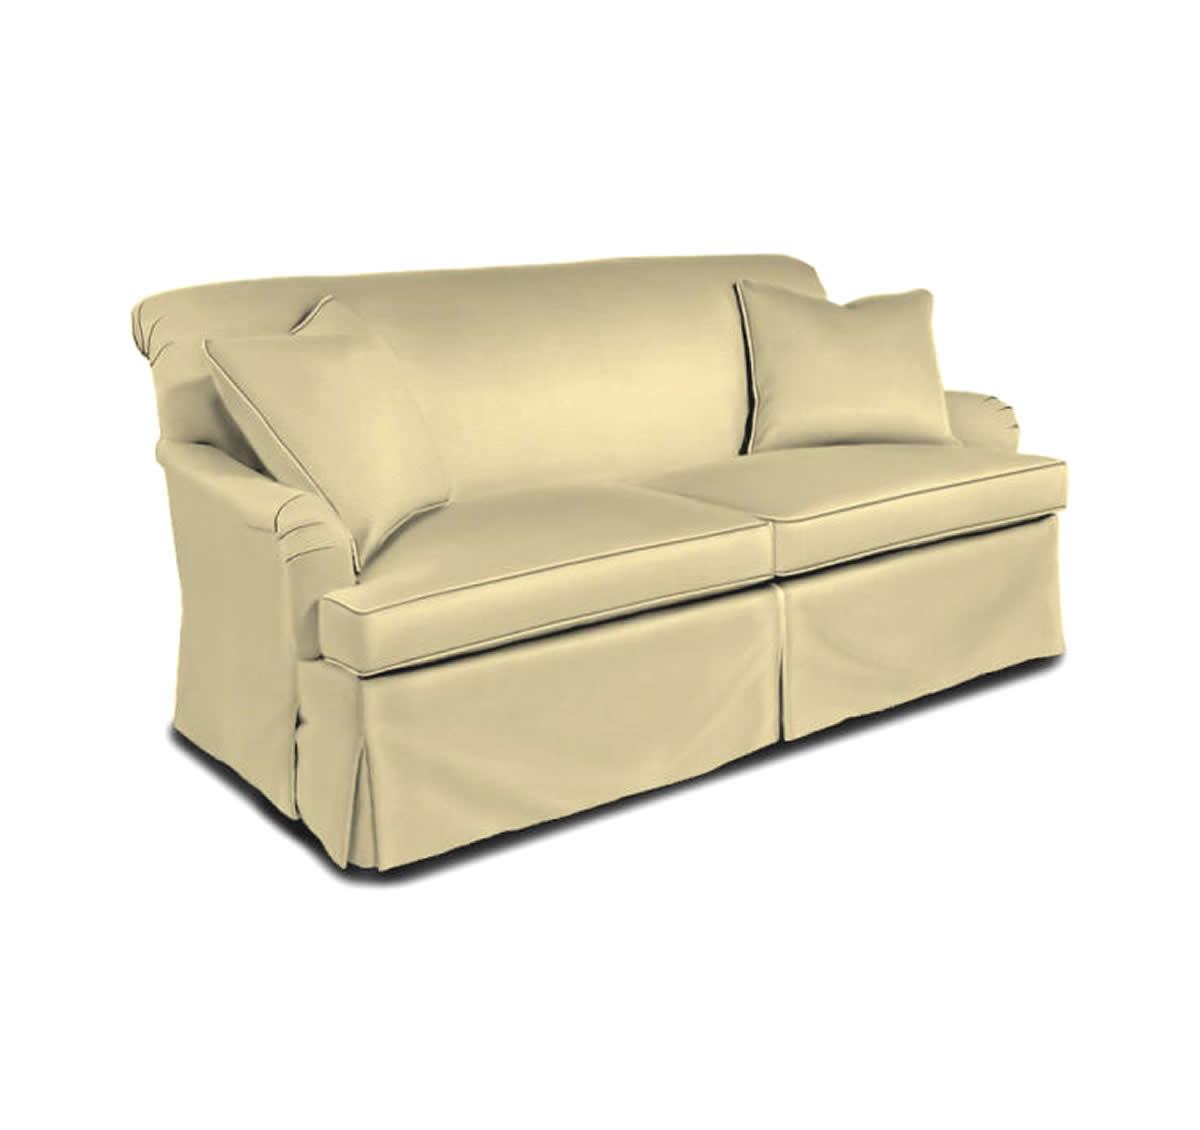 Kenton Sofa